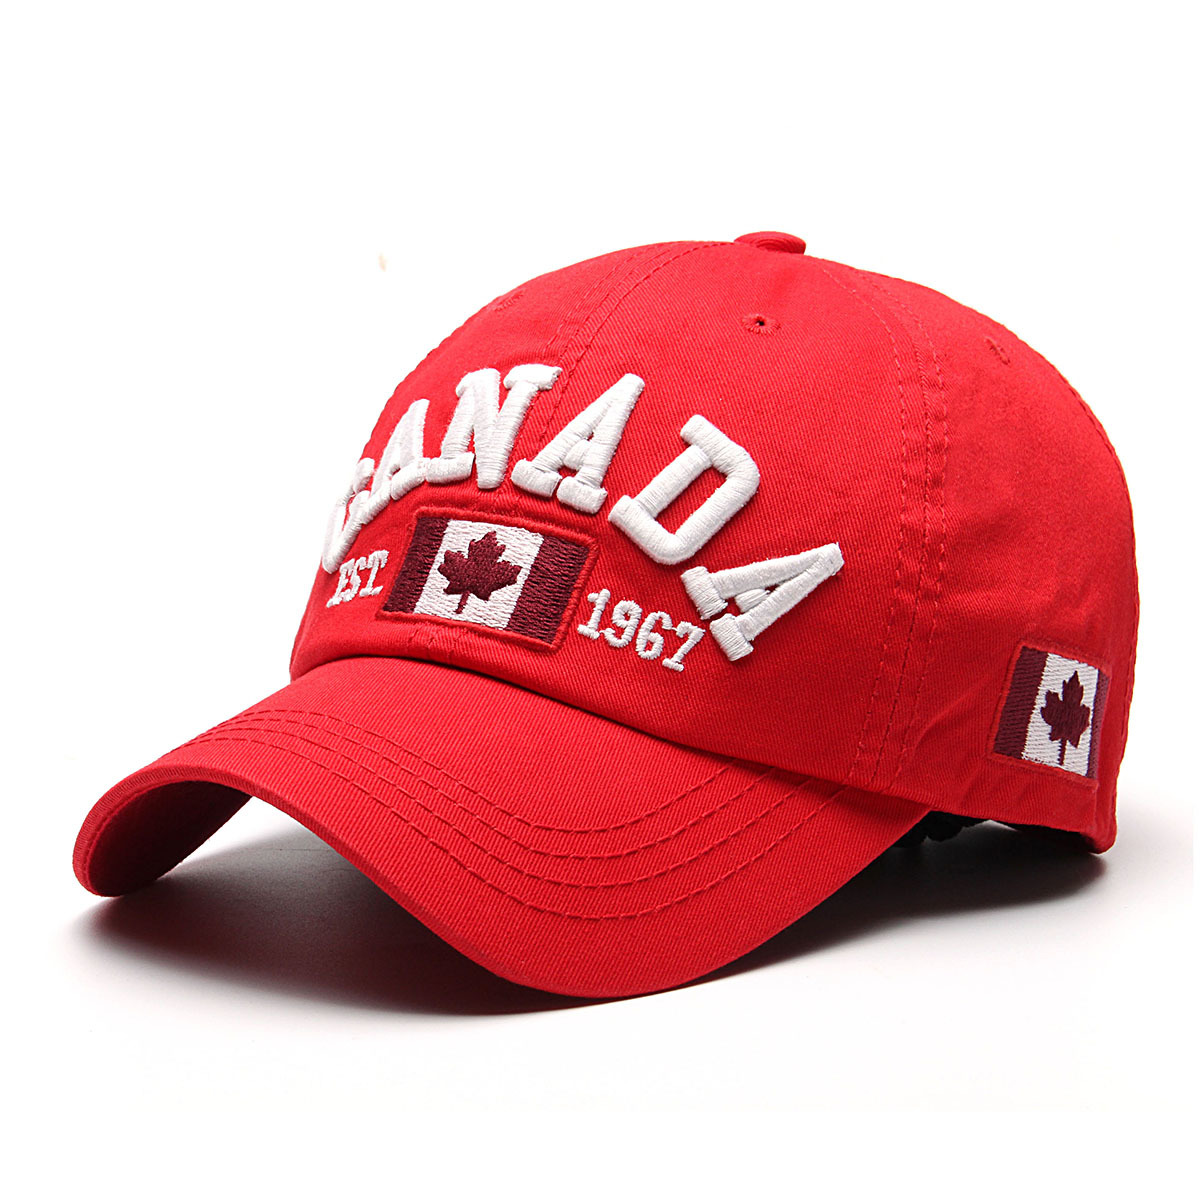 Uinn Adapula Yong Polo Fashion Gaya Orang Topi Bola Baseball Cap Polos Mursidah Pria Wanita Kanada Bendera Sandaran Adjuatable Olahraga Golf Hip Hop Hat